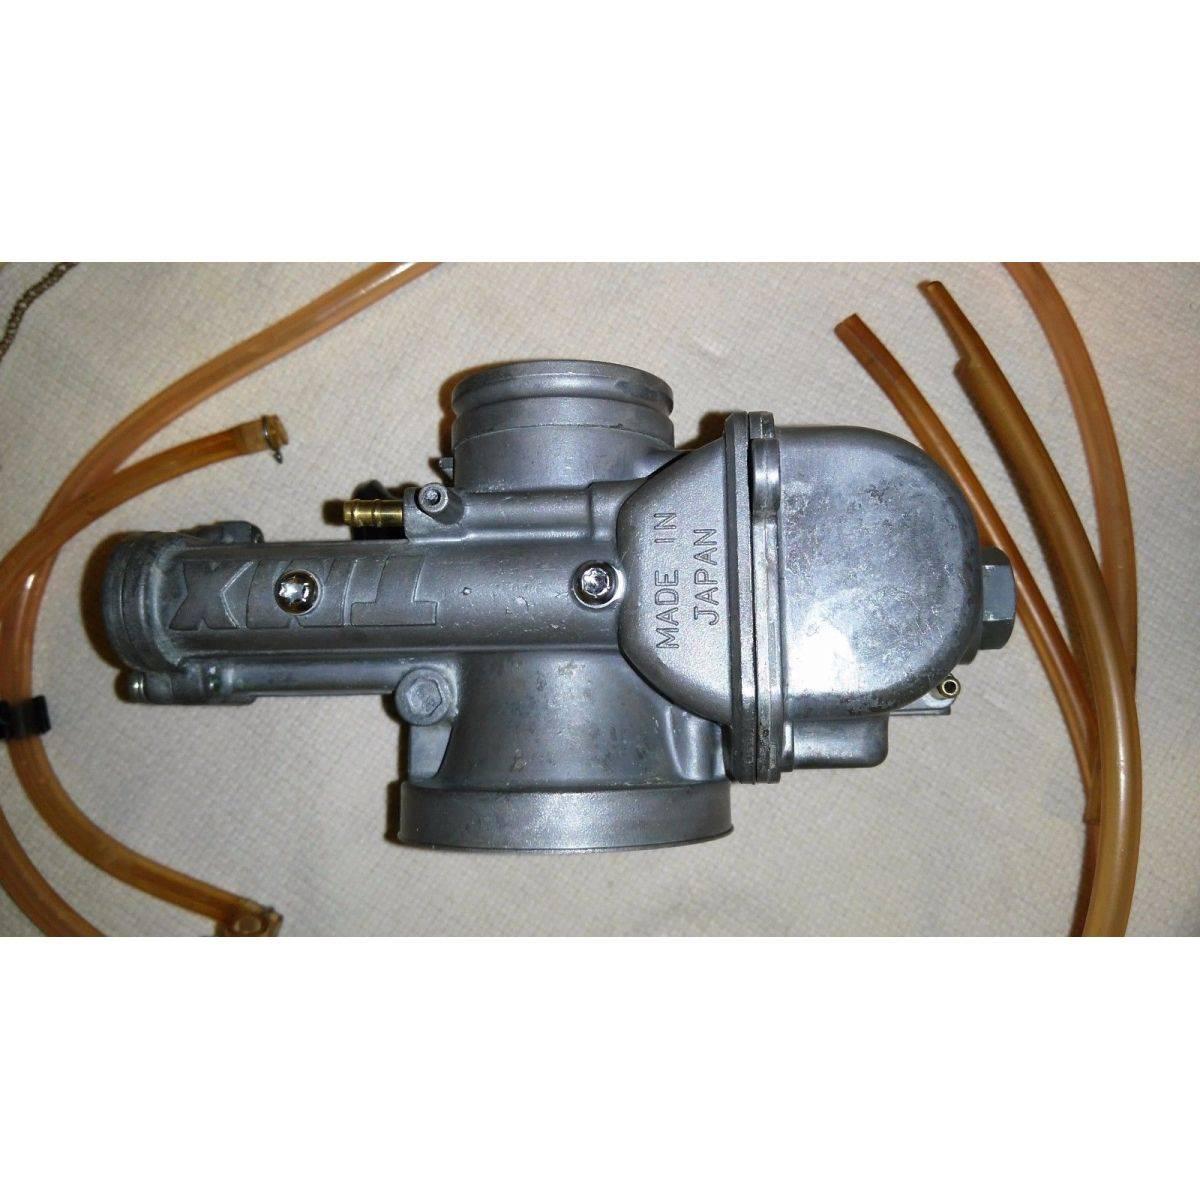 Carburador Mikuni Tmx 38mm USADO  - T & T Soluções